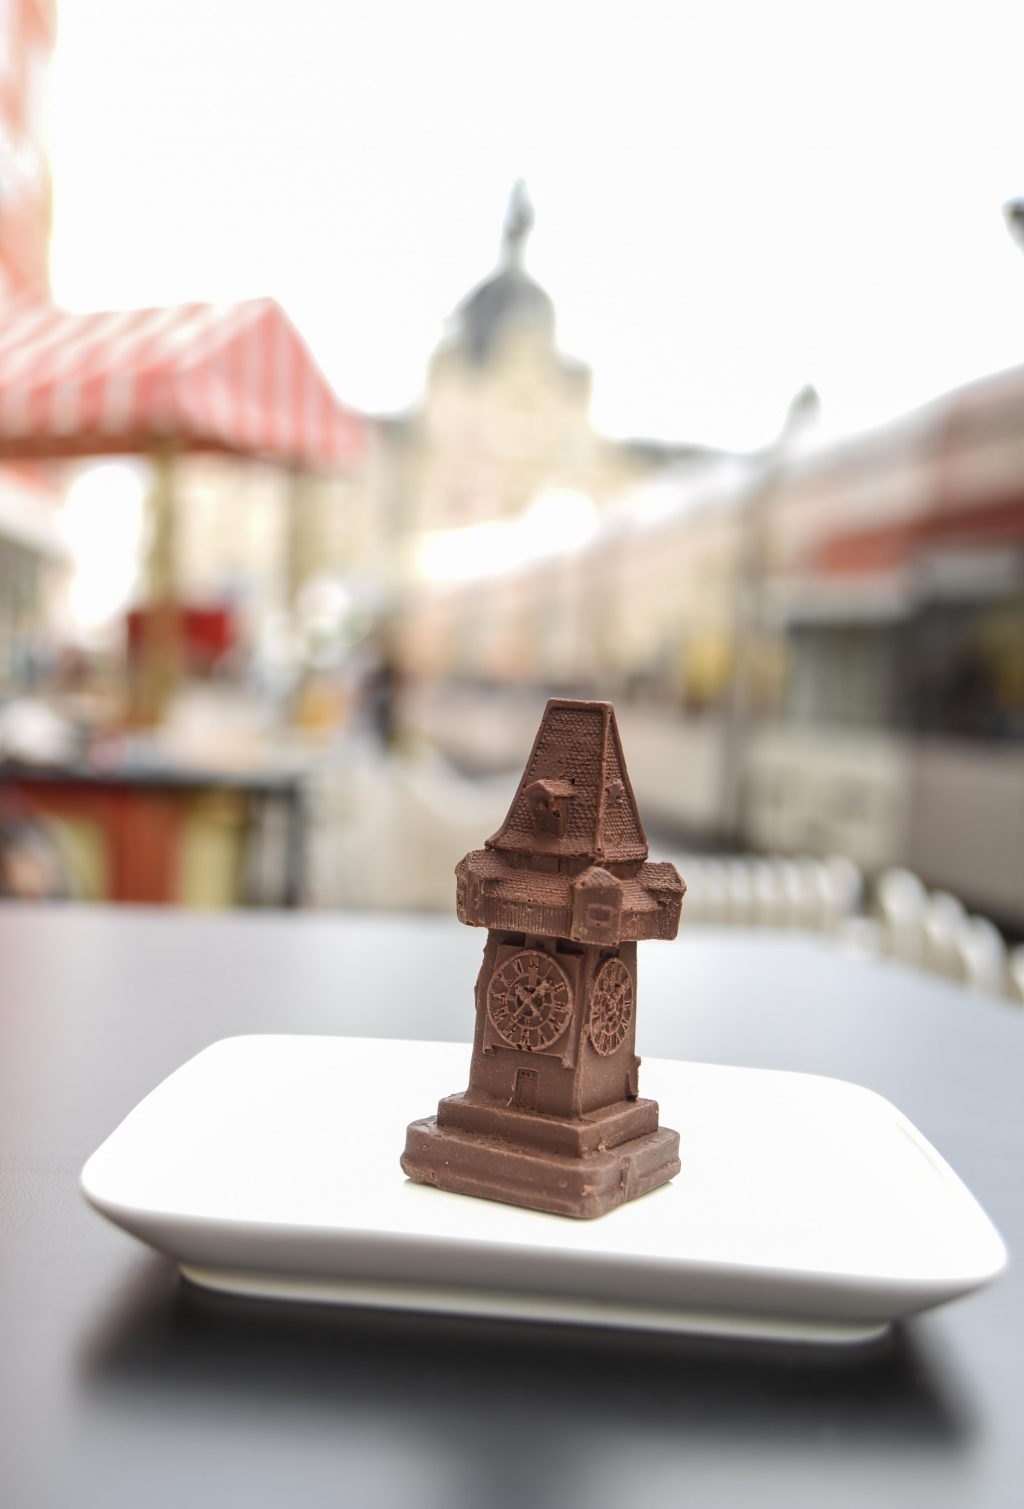 Süßer Steirer Süßer Uhrturm © Süßer Steirer